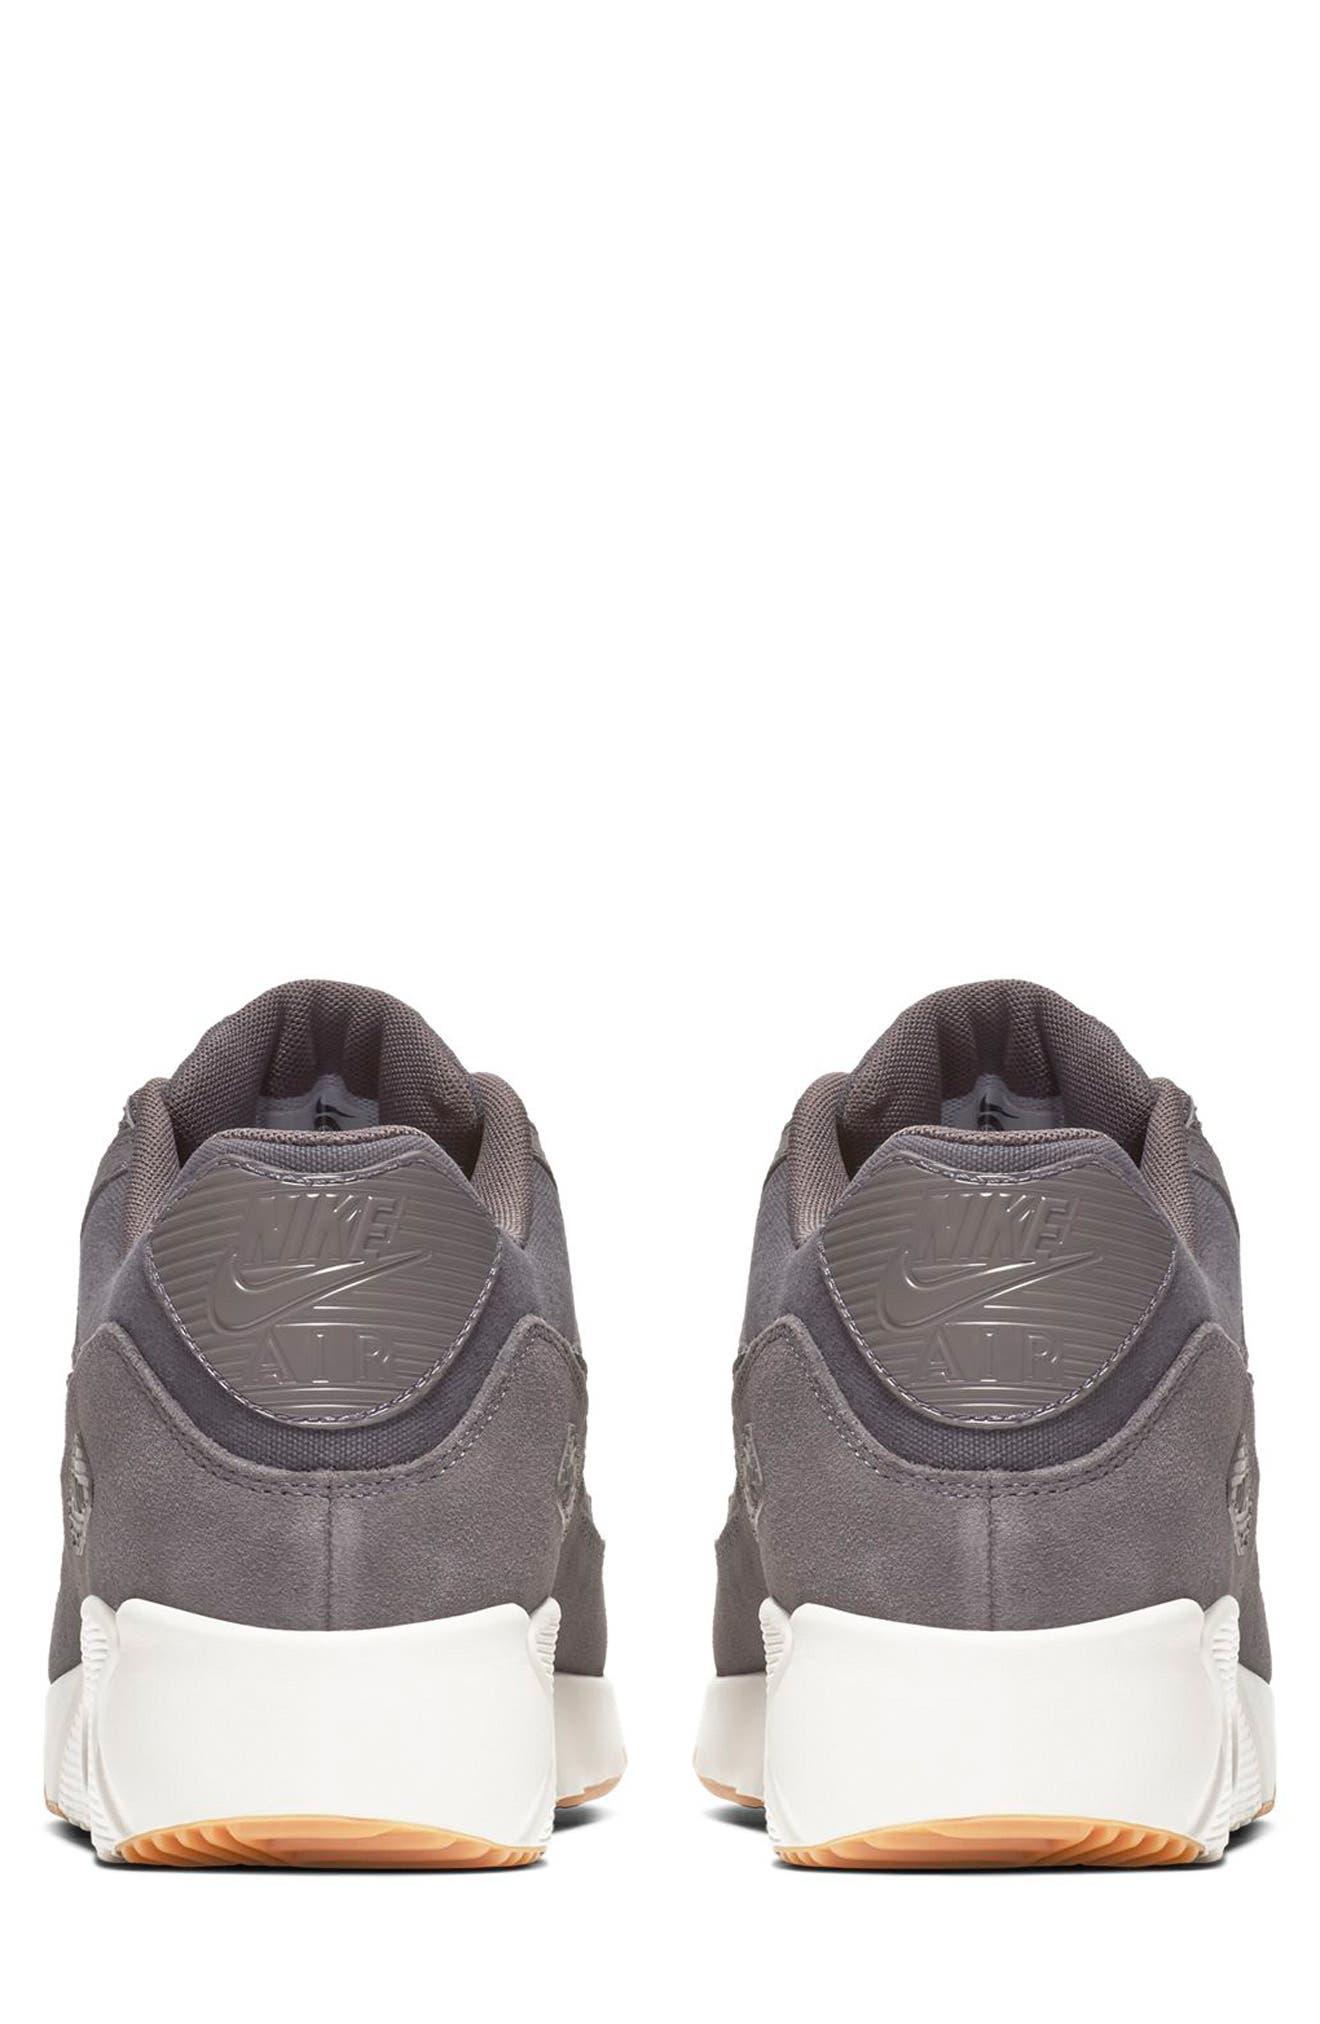 Air Max 90 Ultra 2.0 Sneaker,                             Alternate thumbnail 5, color,                             THUNDER GREY/ GREY/ LIGHT BONE